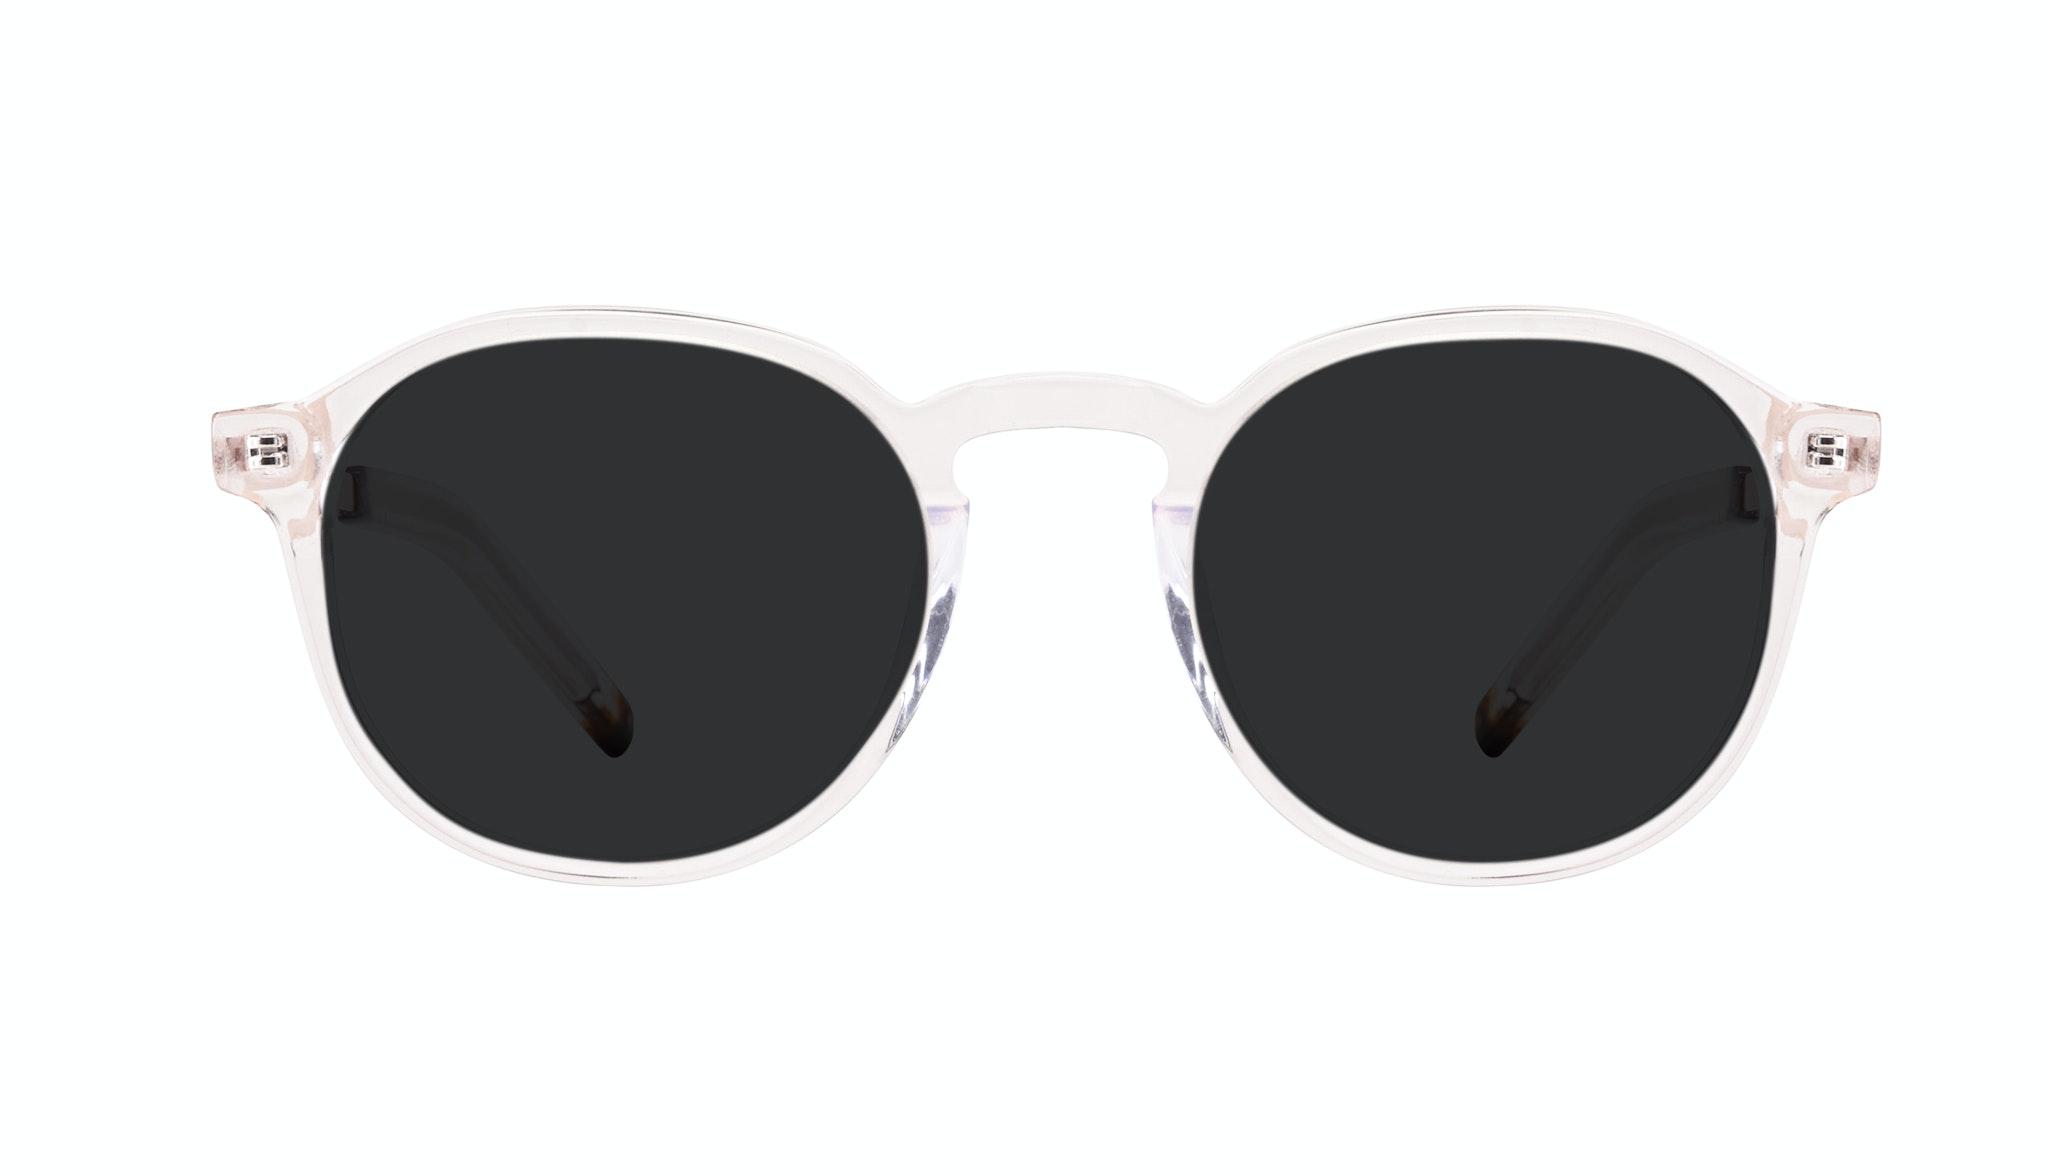 Affordable Fashion Glasses Round Sunglasses Men Prime XL Clear